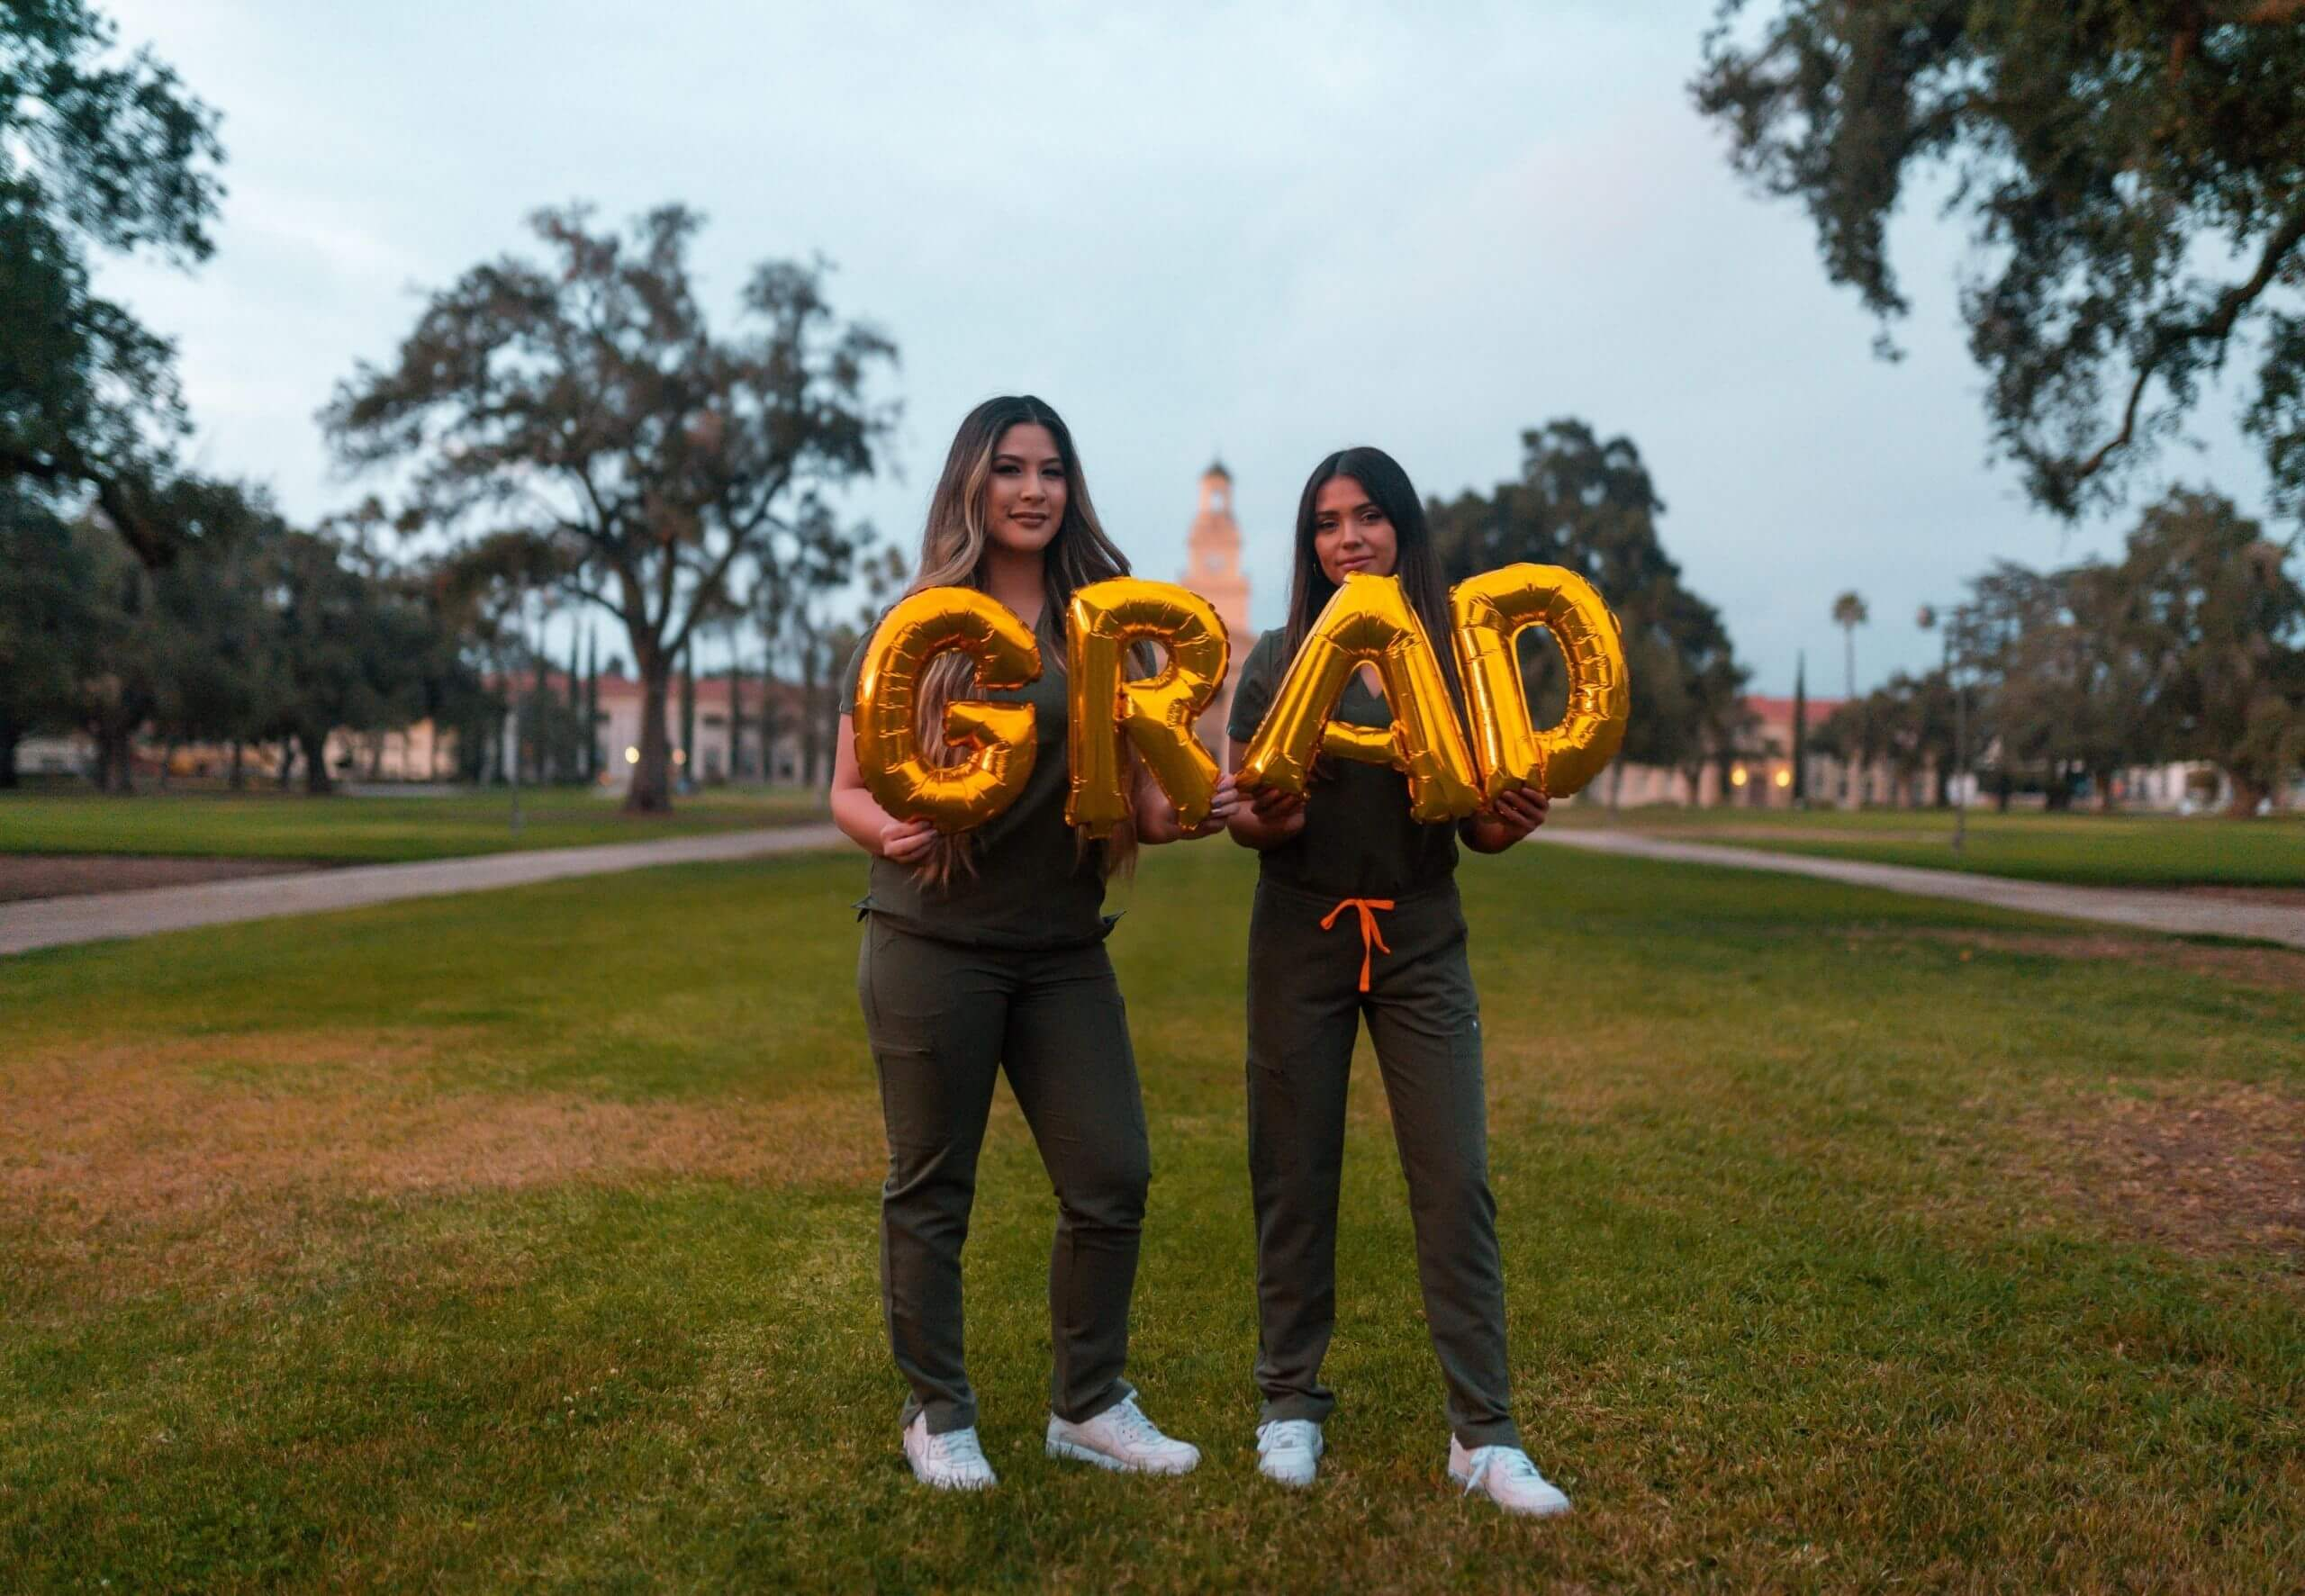 life insurance for grads